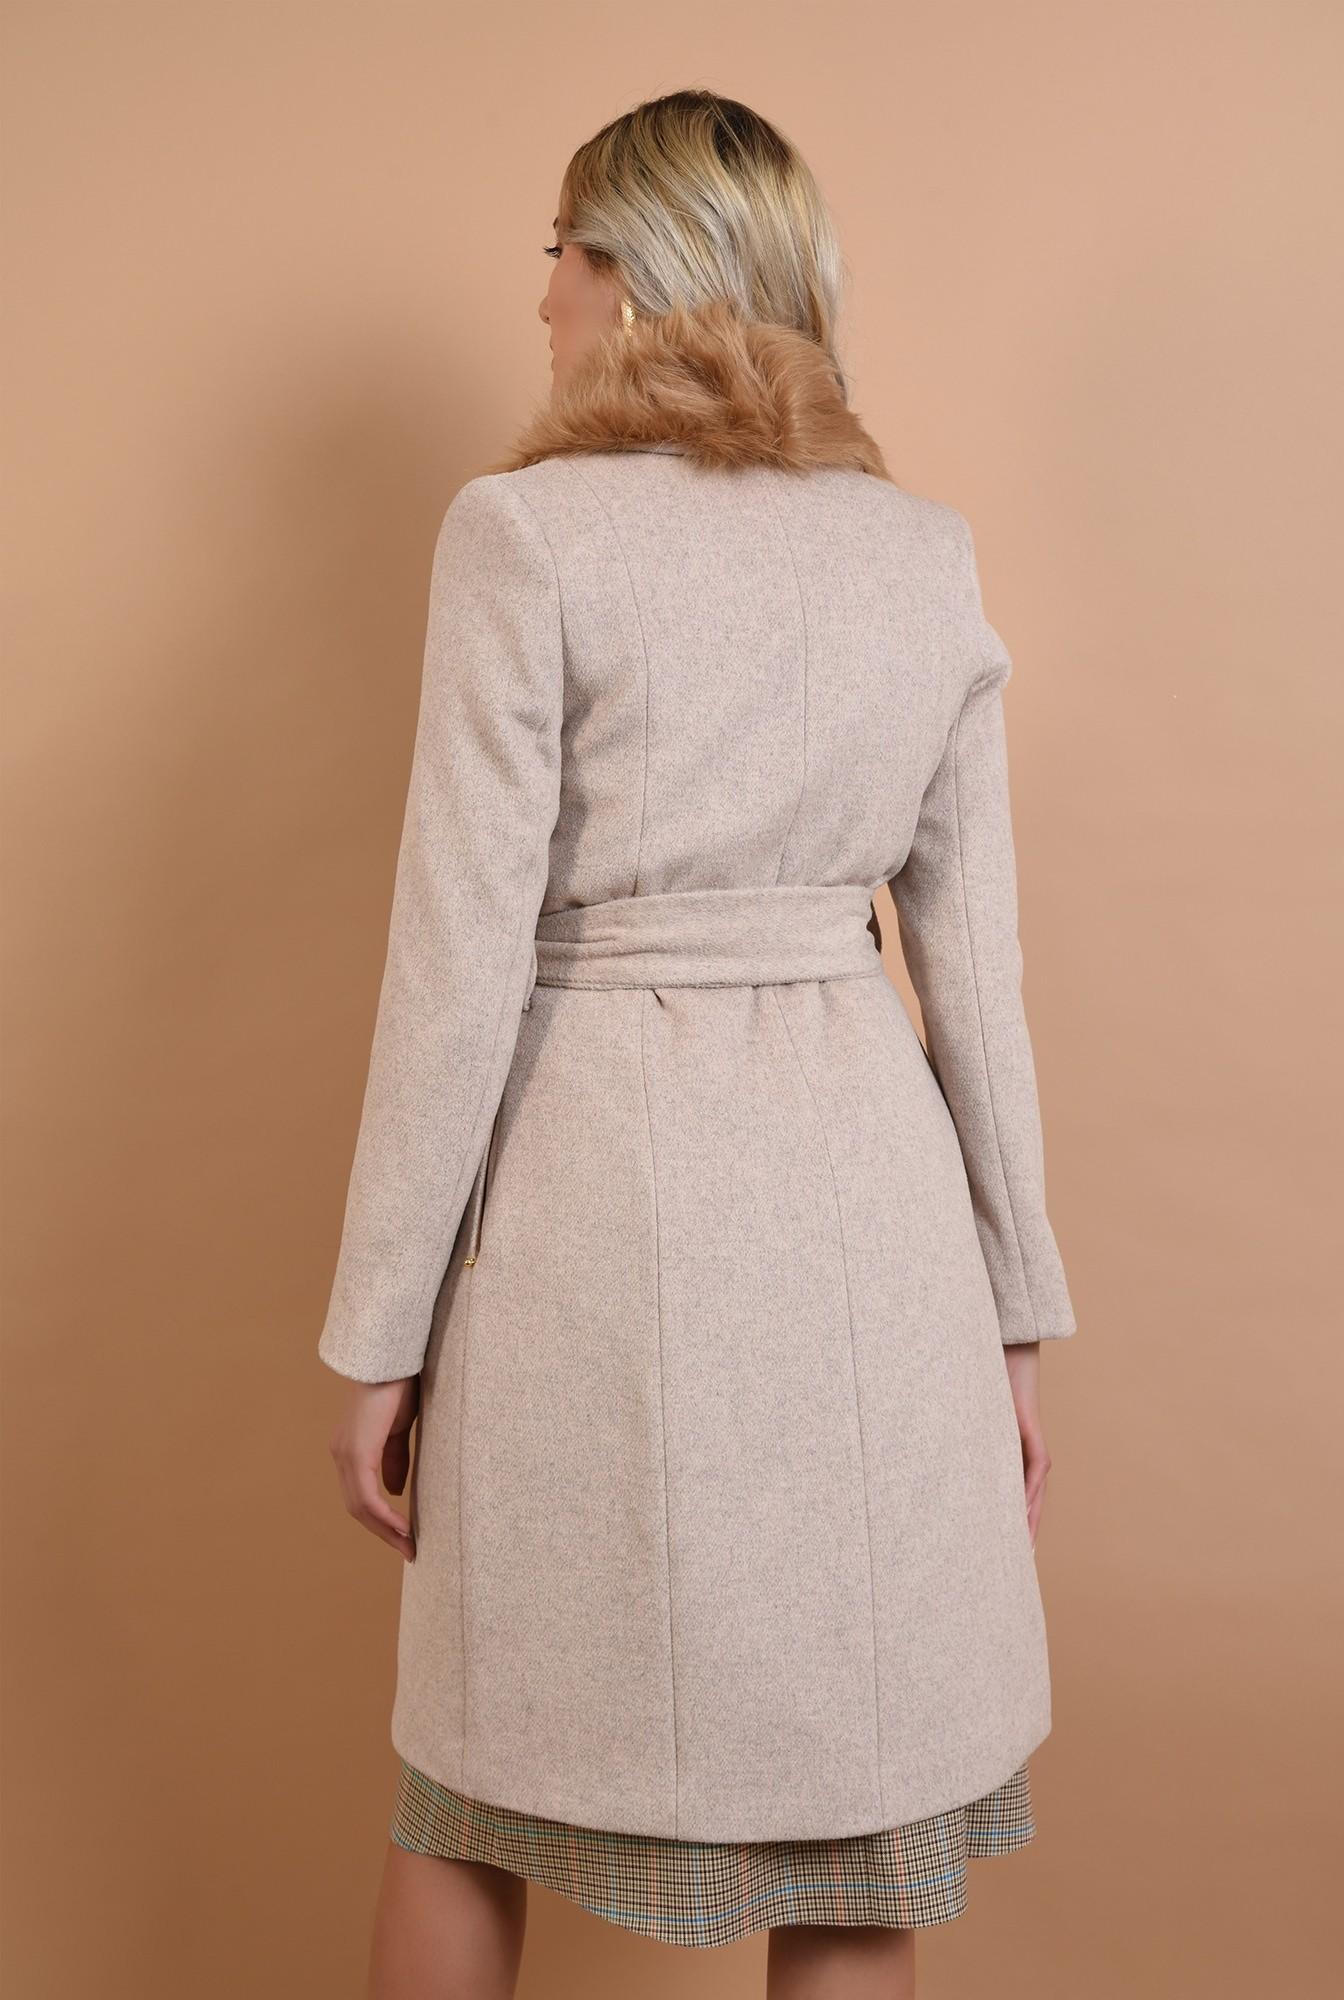 1 - palton bej, cu blana, Poema, croi cambrat, midi